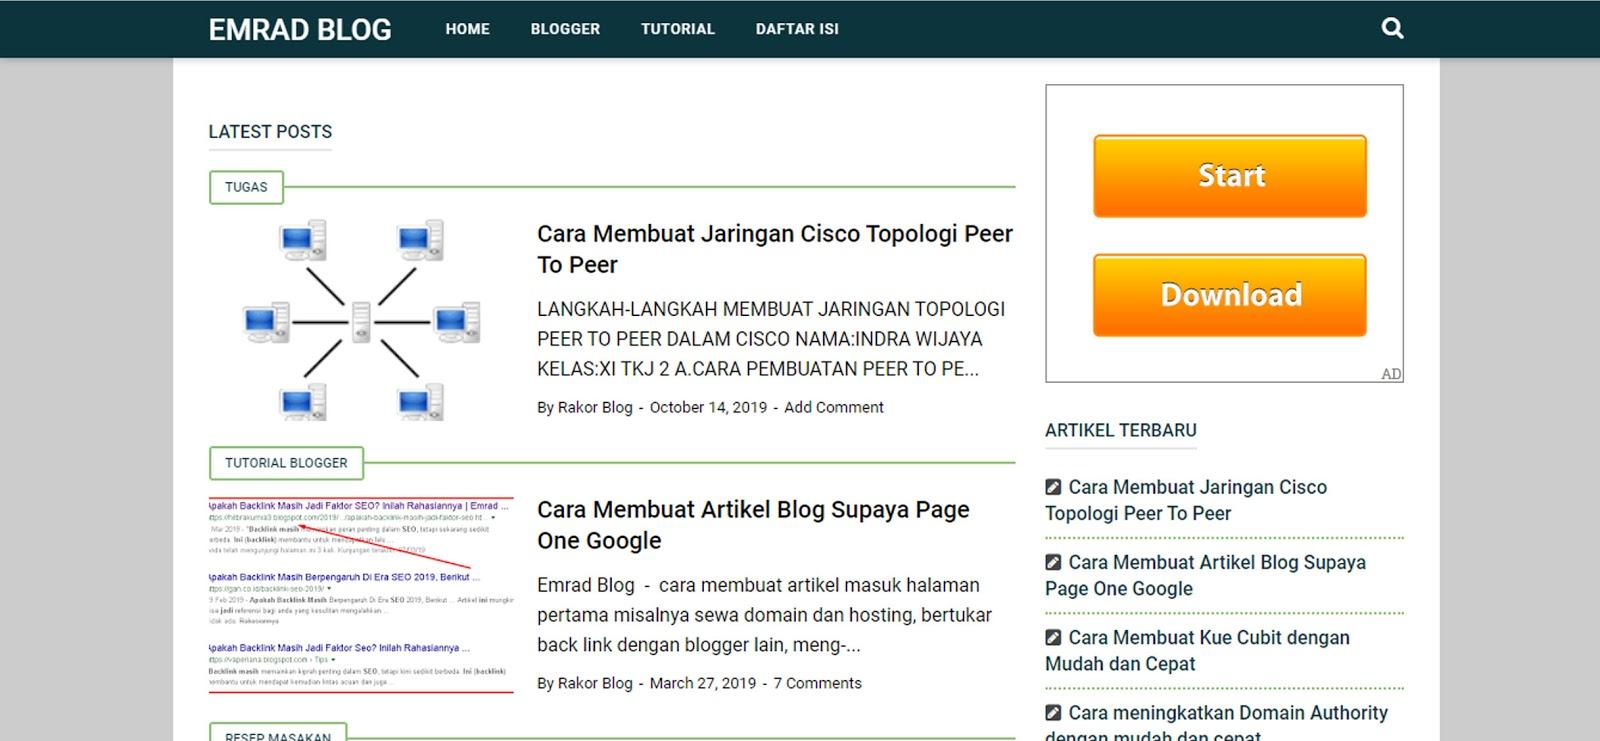 abp-emrad-blog